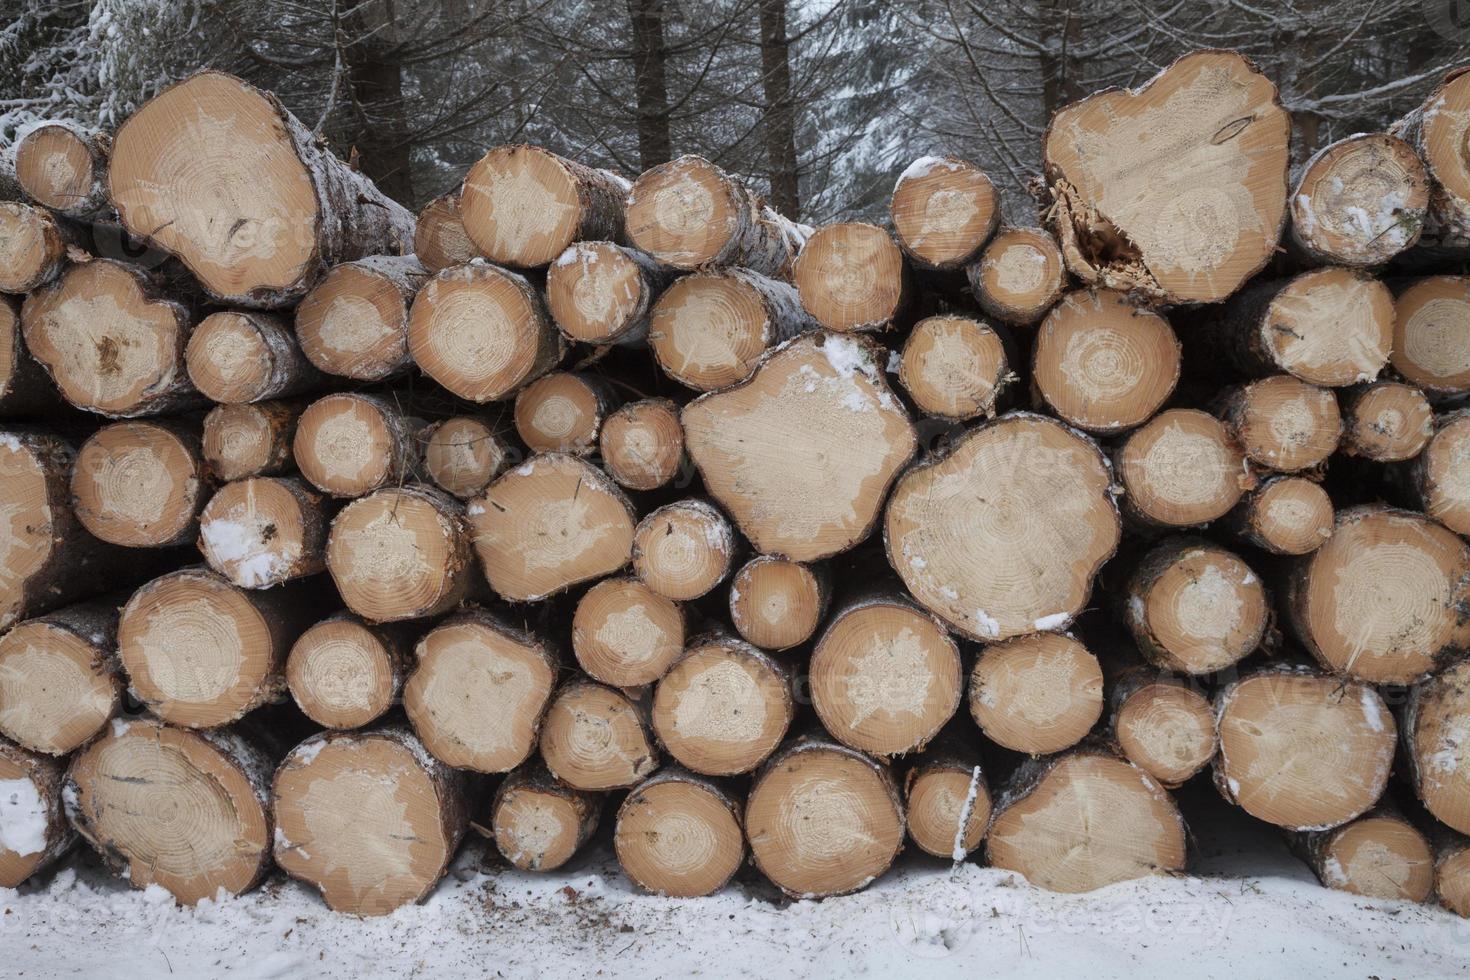 Duitsland, boomstammen in de winter foto